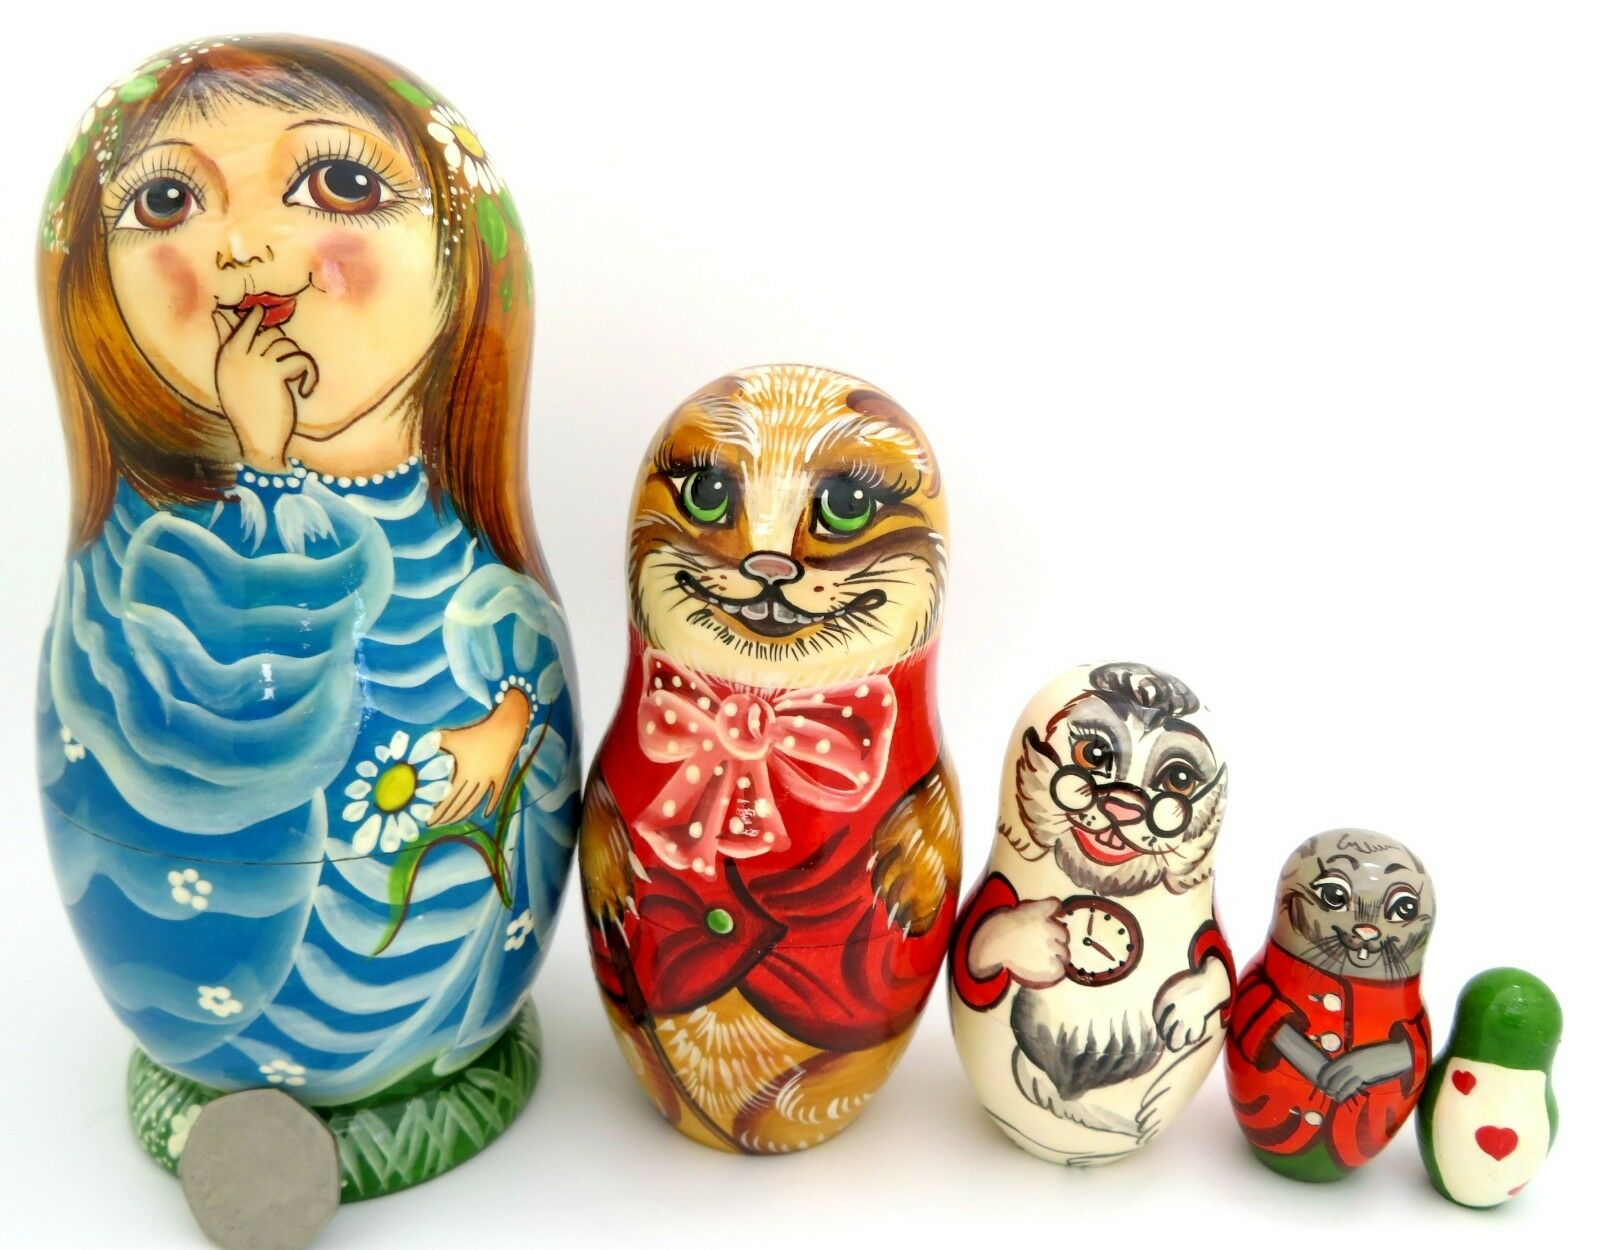 Dtuttia Russia Russe Matrioska 5 Alice  in Wonderle Cheshire Cat Coniglio Bianco  vendita online risparmia il 70%